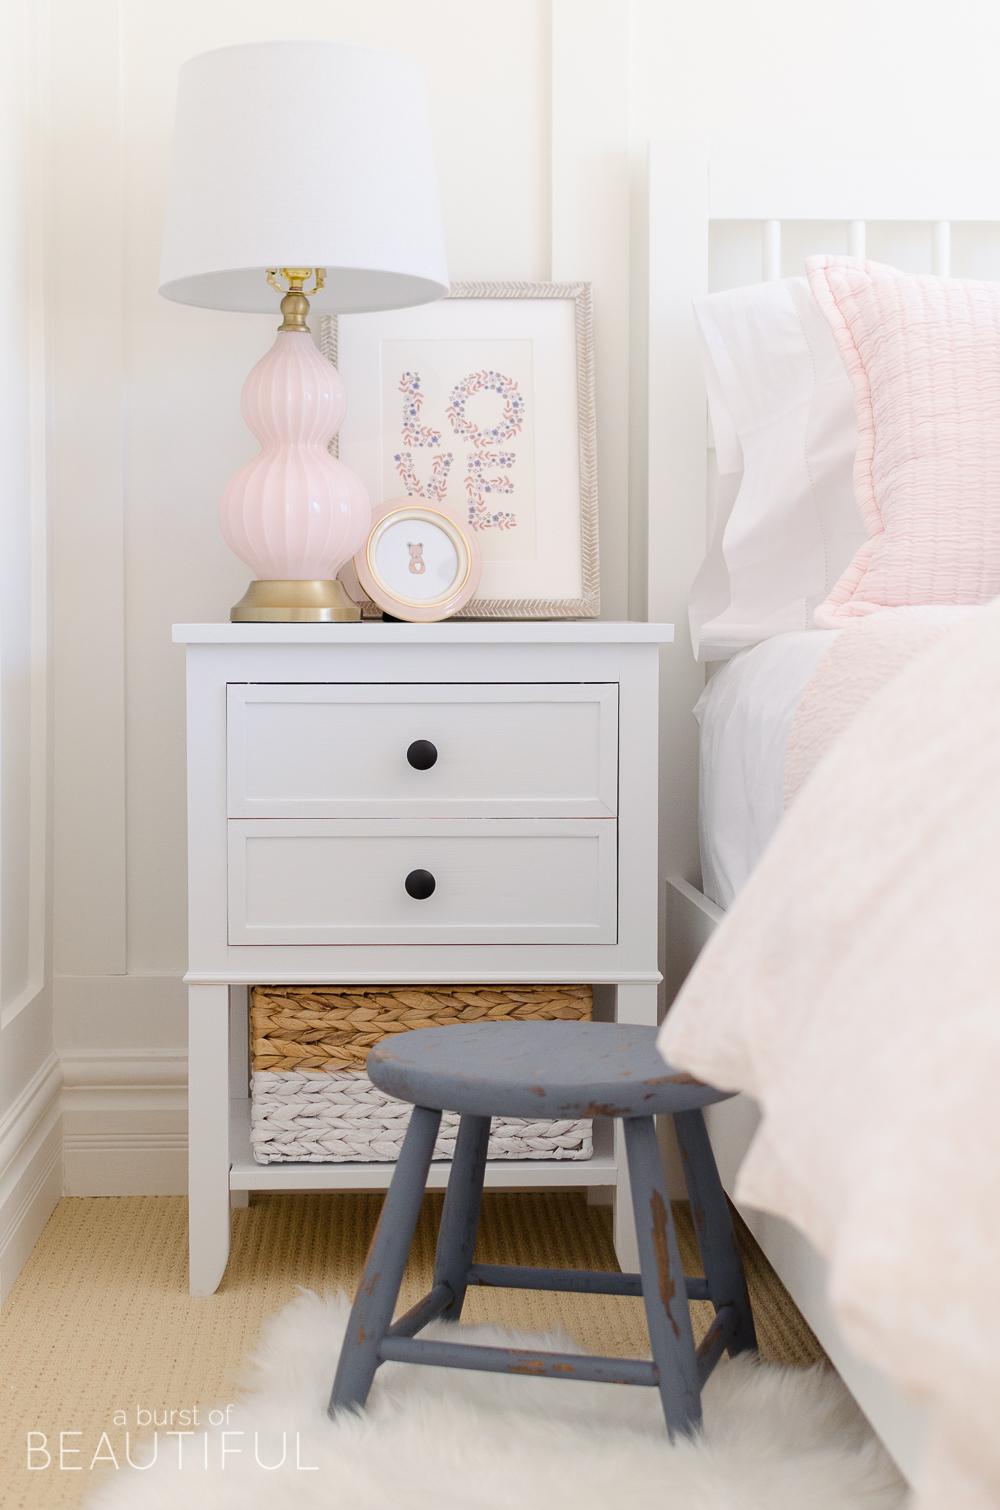 Toddler Girl Pink Bedroom Design & Decor side table artwork and lamp